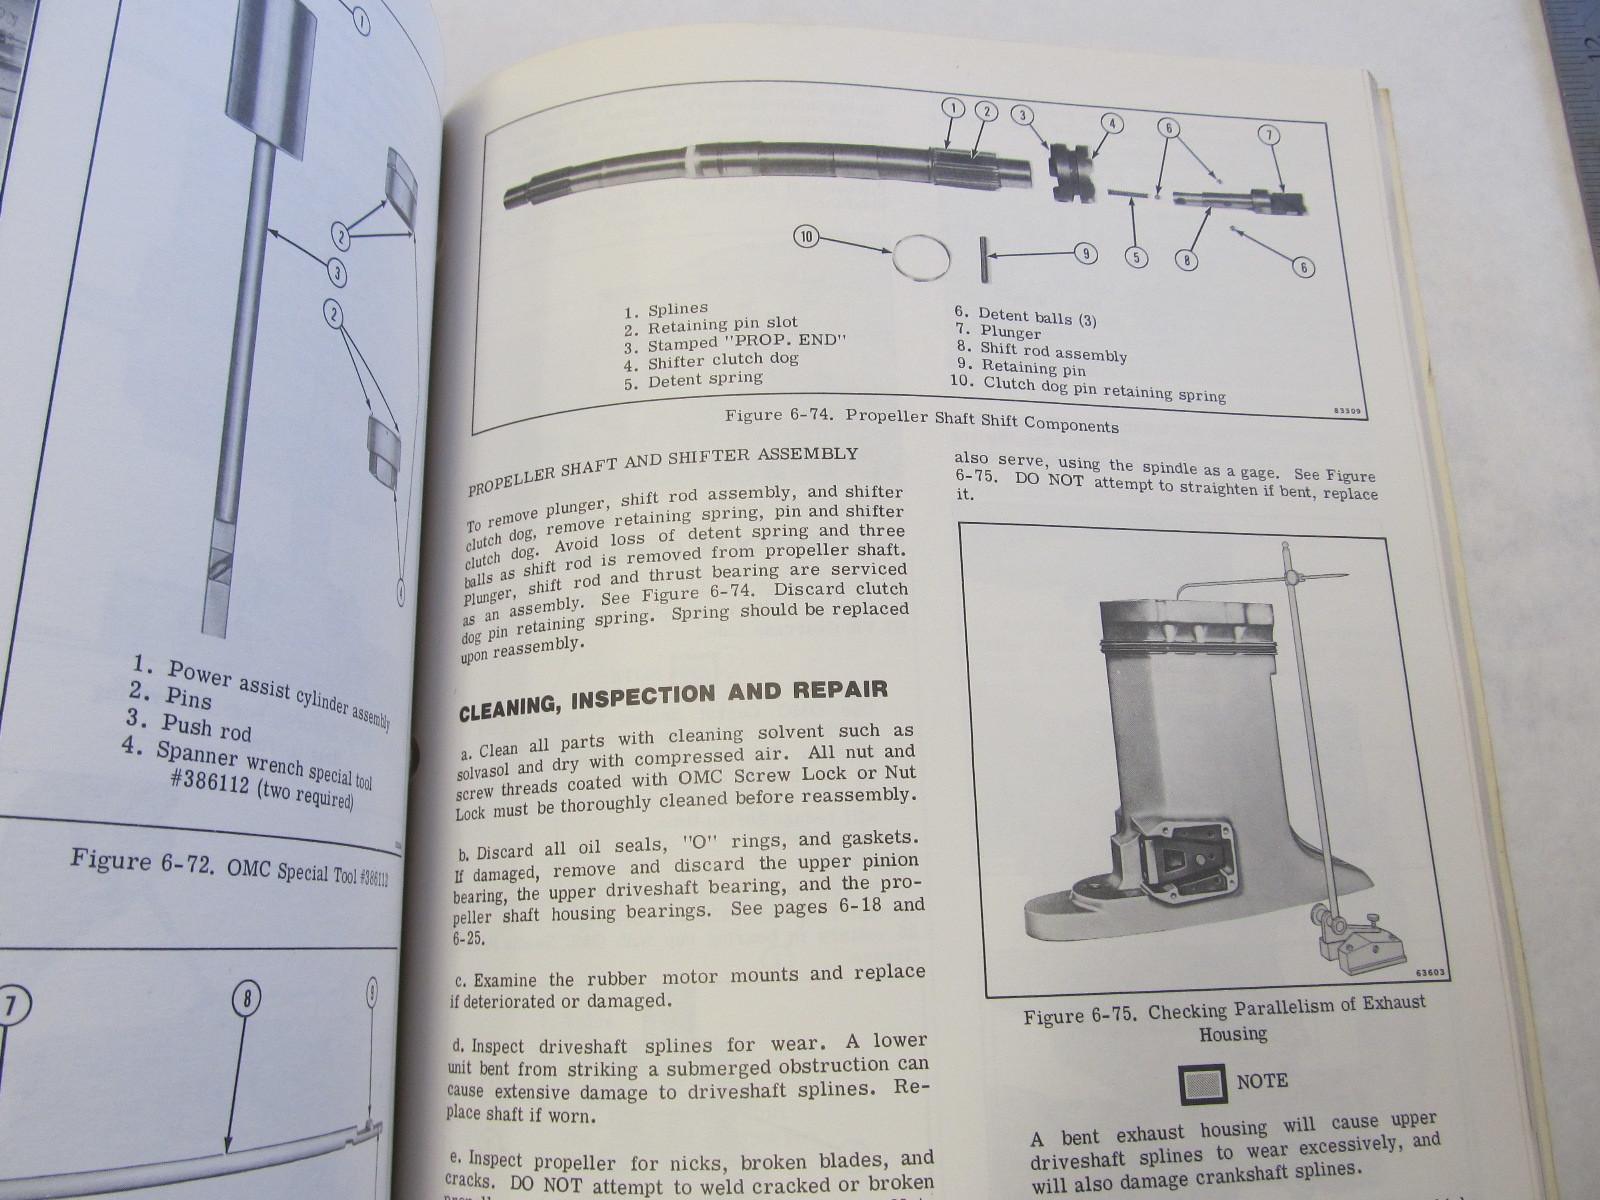 1978 Johnson Outboard Service Manual 175 235 Hp Green